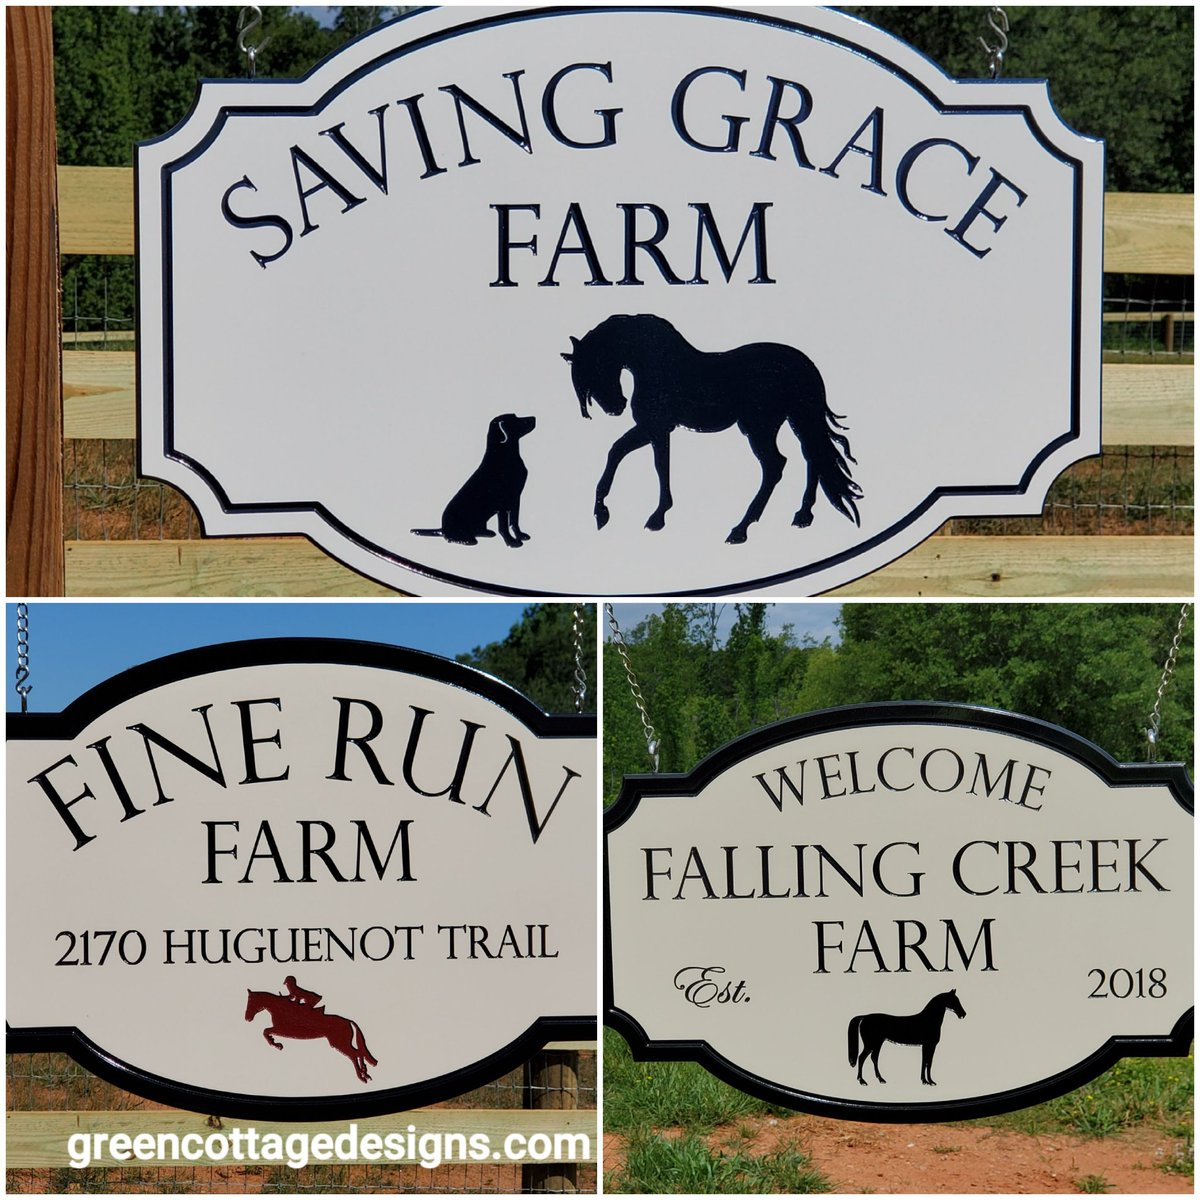 FARM Signs by http://greencottagedesigns.com Custom Outdoor Waterproof PVC Signs for Home & Business #farming #farmlife #HorseFarm #Pets #HorseRacing #customsigns #Virginia #Florida #Texaspic.twitter.com/JU2IuRDL57